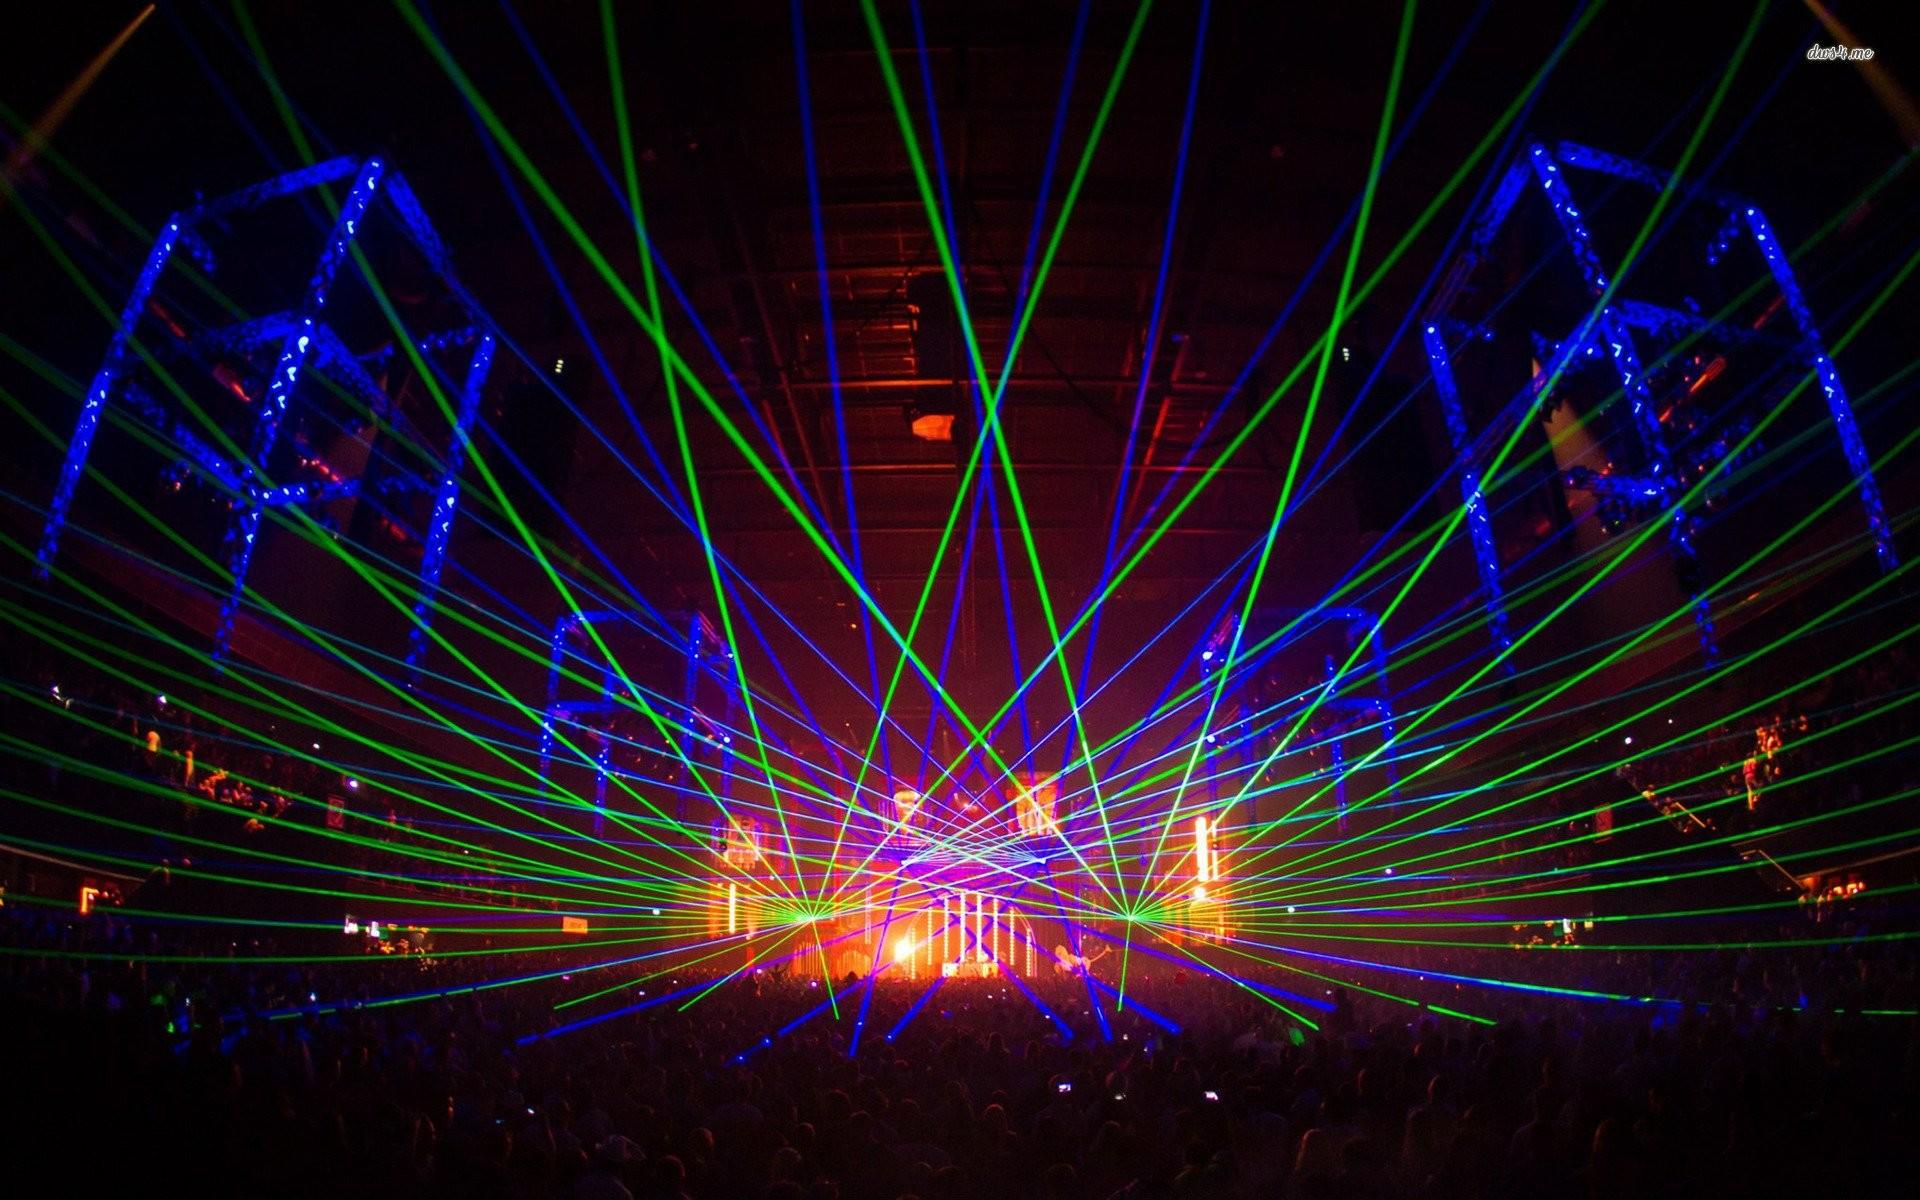 Laser Lights Wallpapers – https://hdwallpapersf.com/laser-lights-